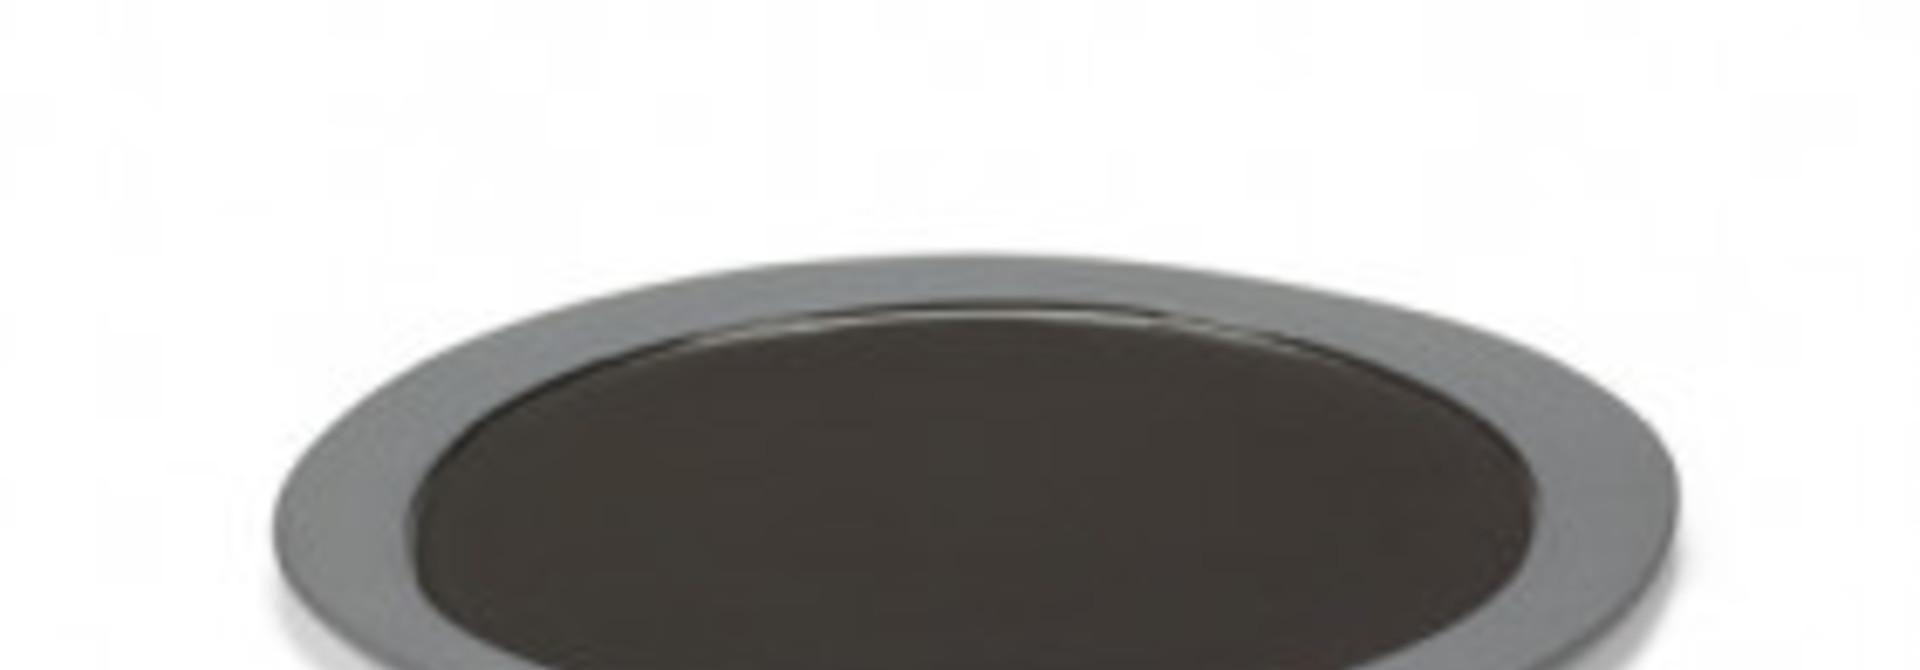 Lunch Plate - M. Baas - Grey